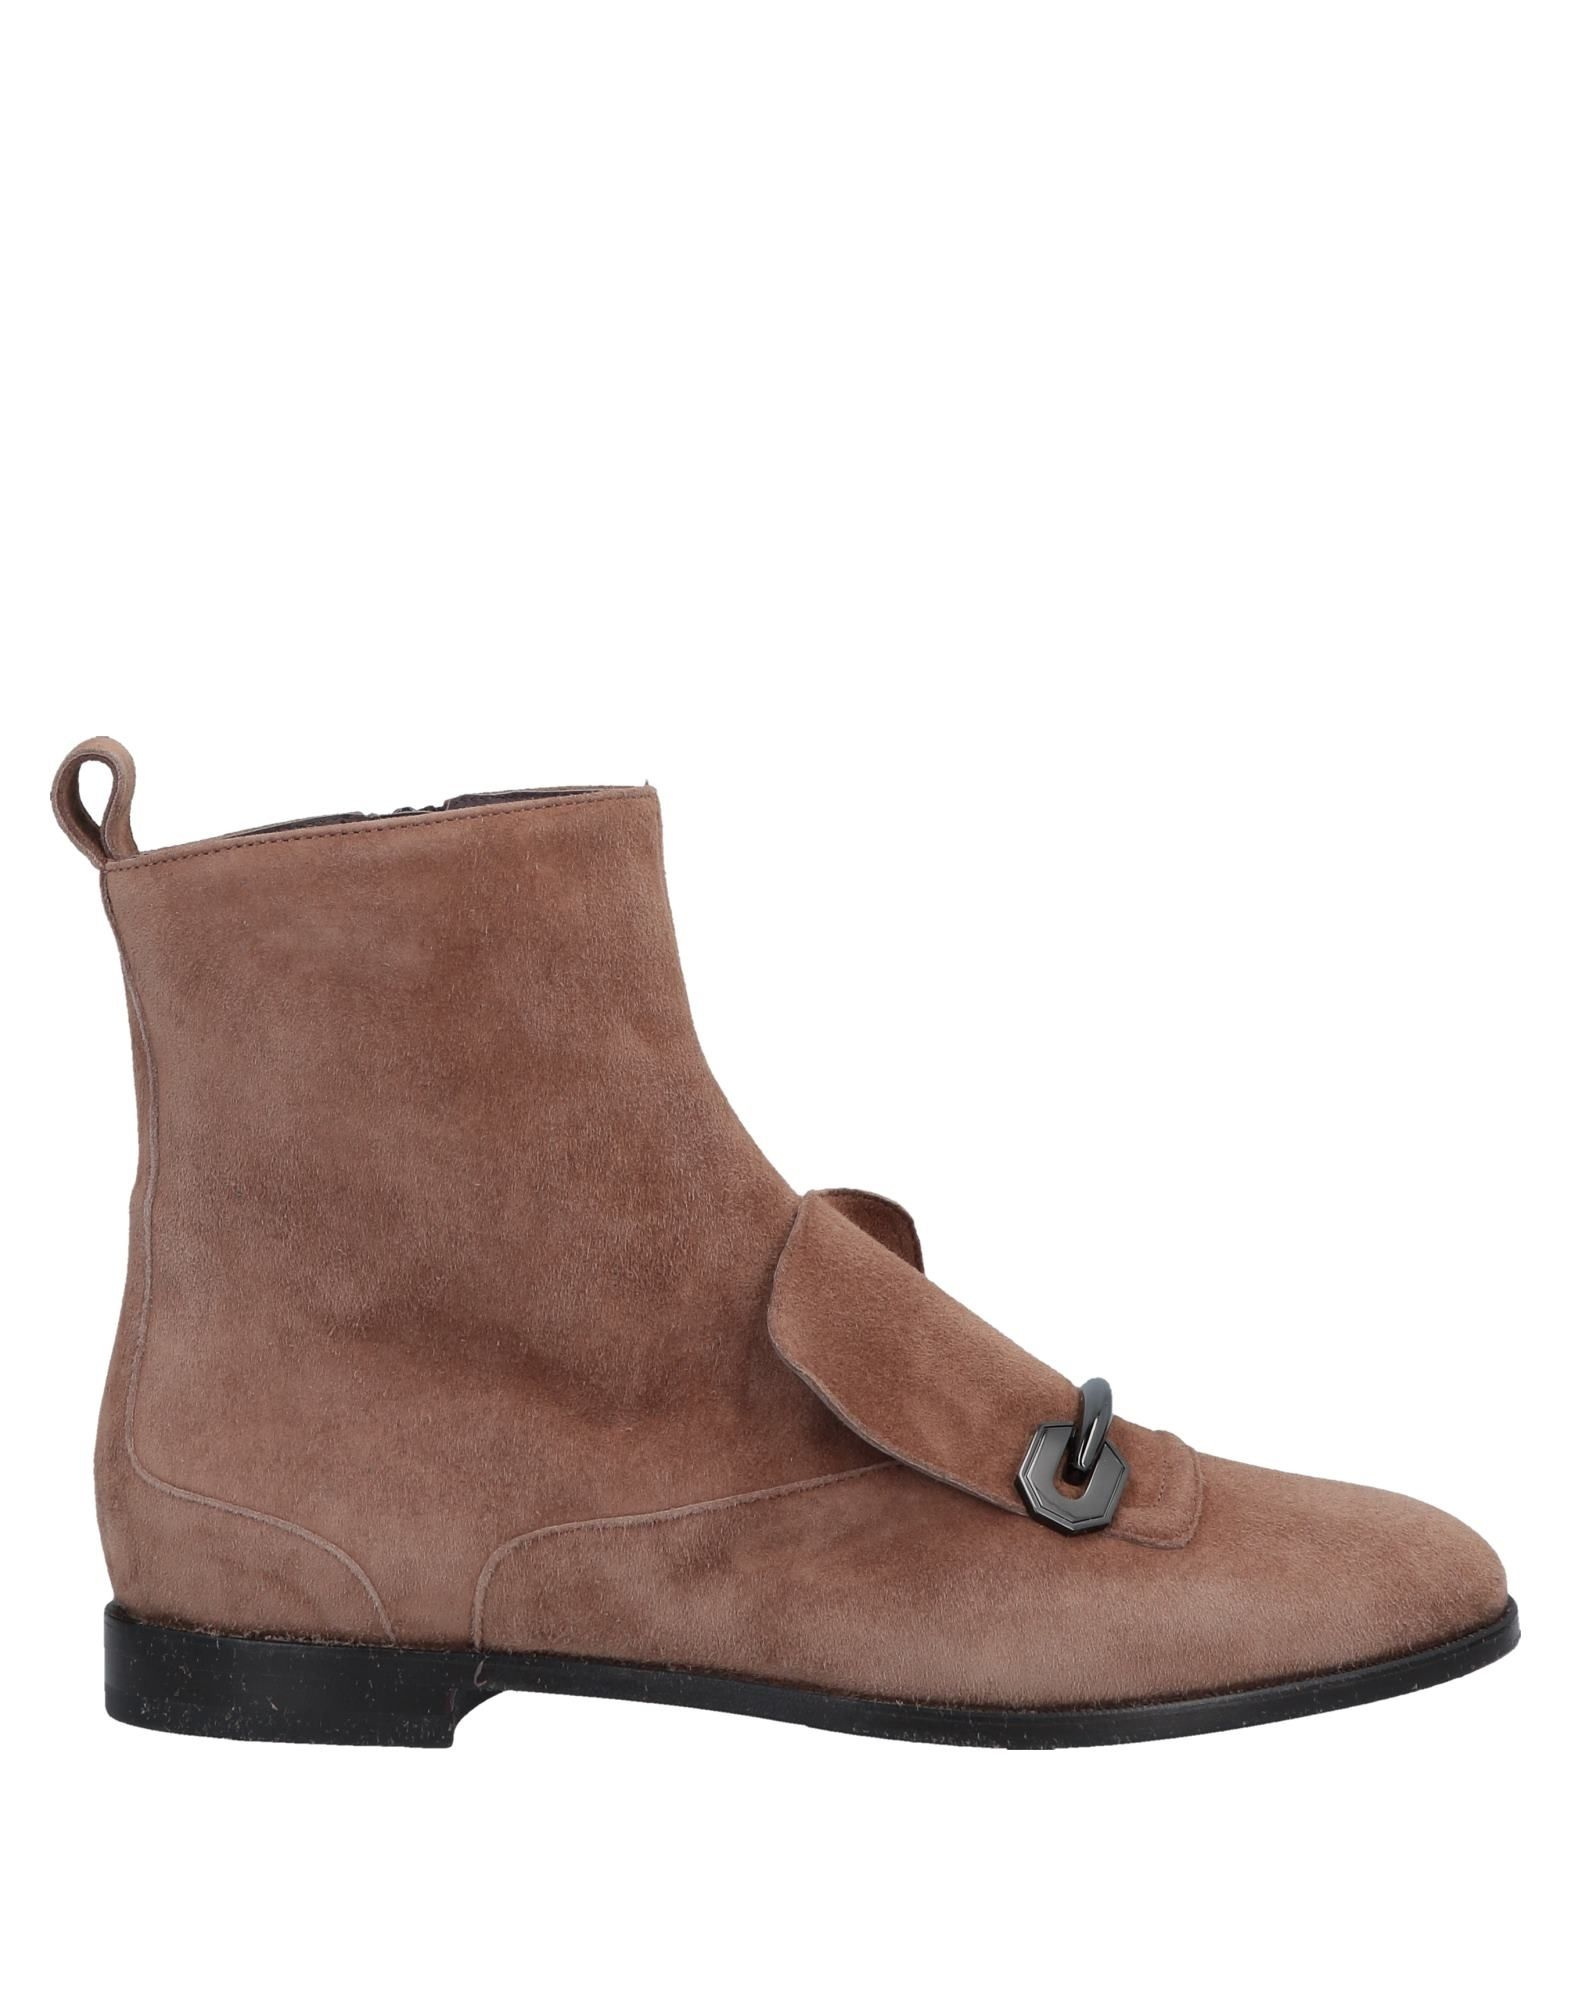 MAGLI by BRUNO MAGLI Полусапоги и высокие ботинки bruno bonelli полусапоги и высокие ботинки